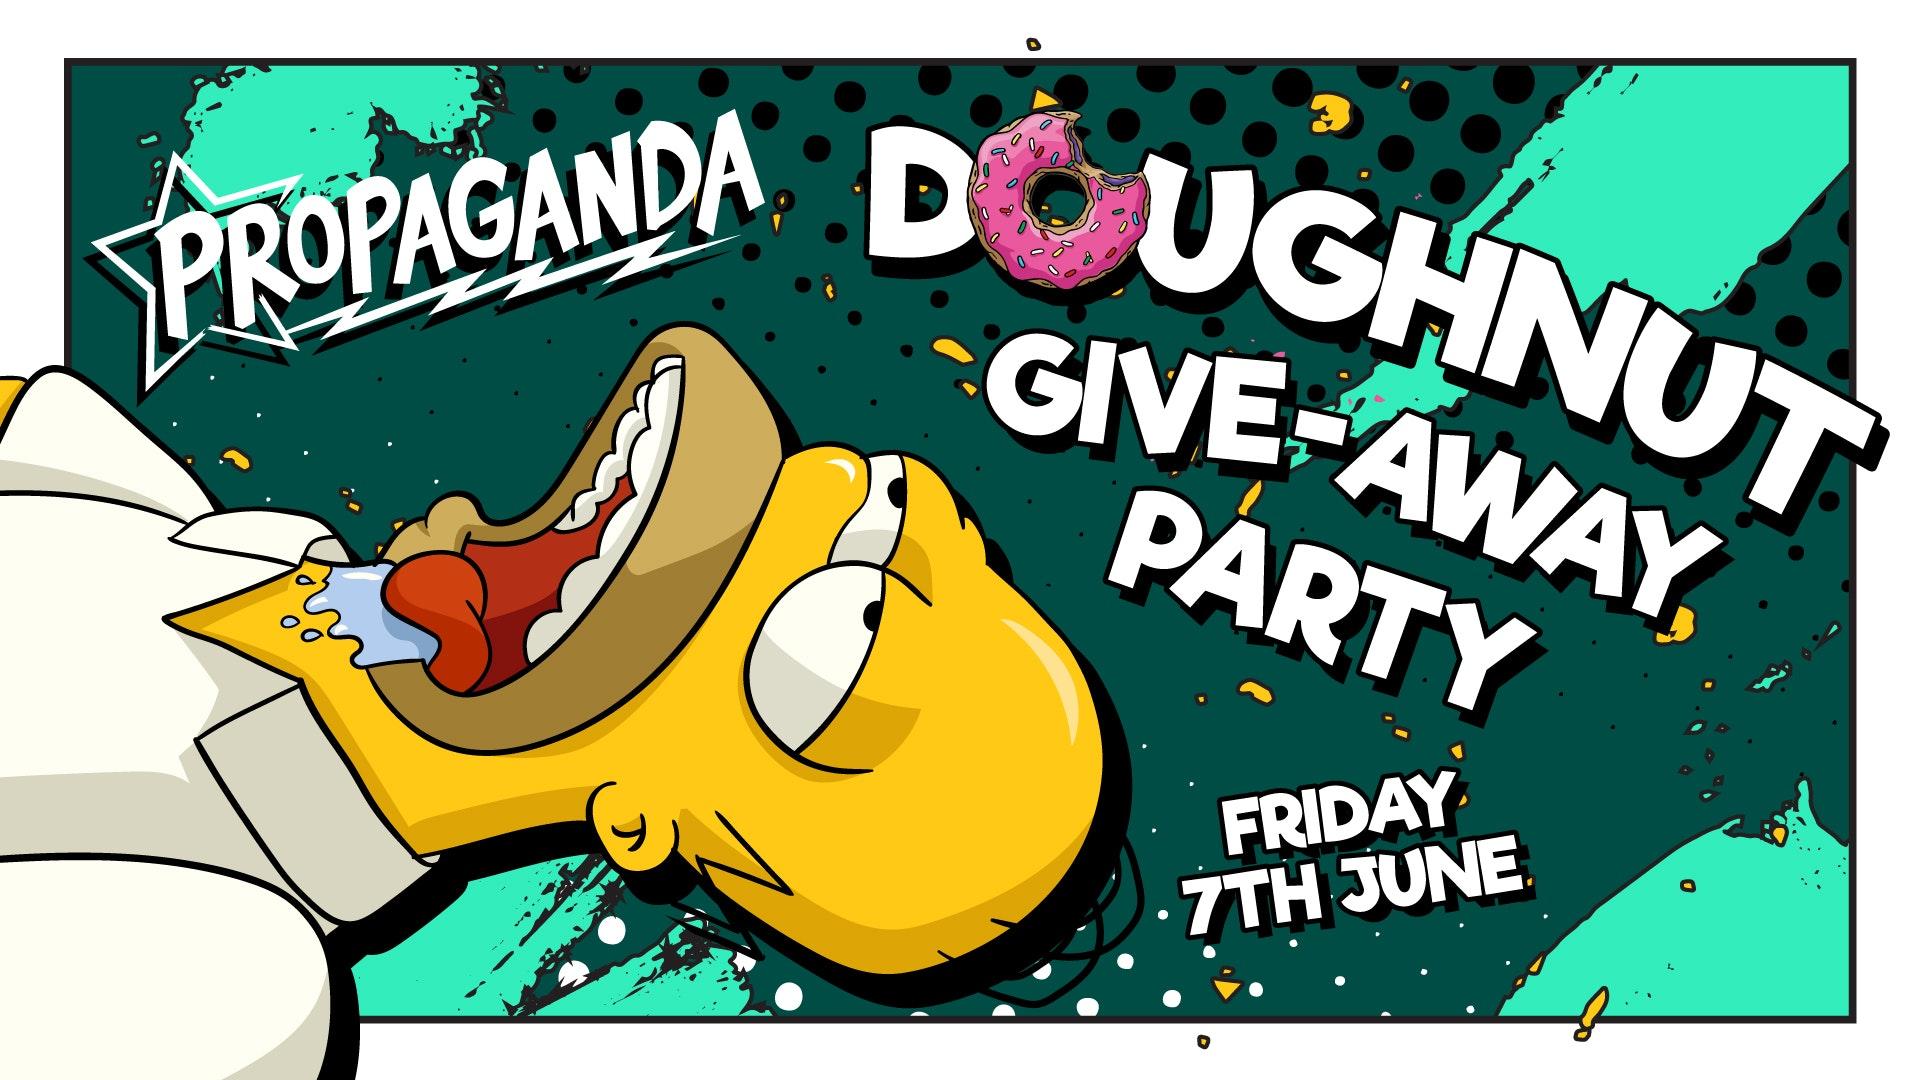 Propaganda Norwich – Doughnut Party